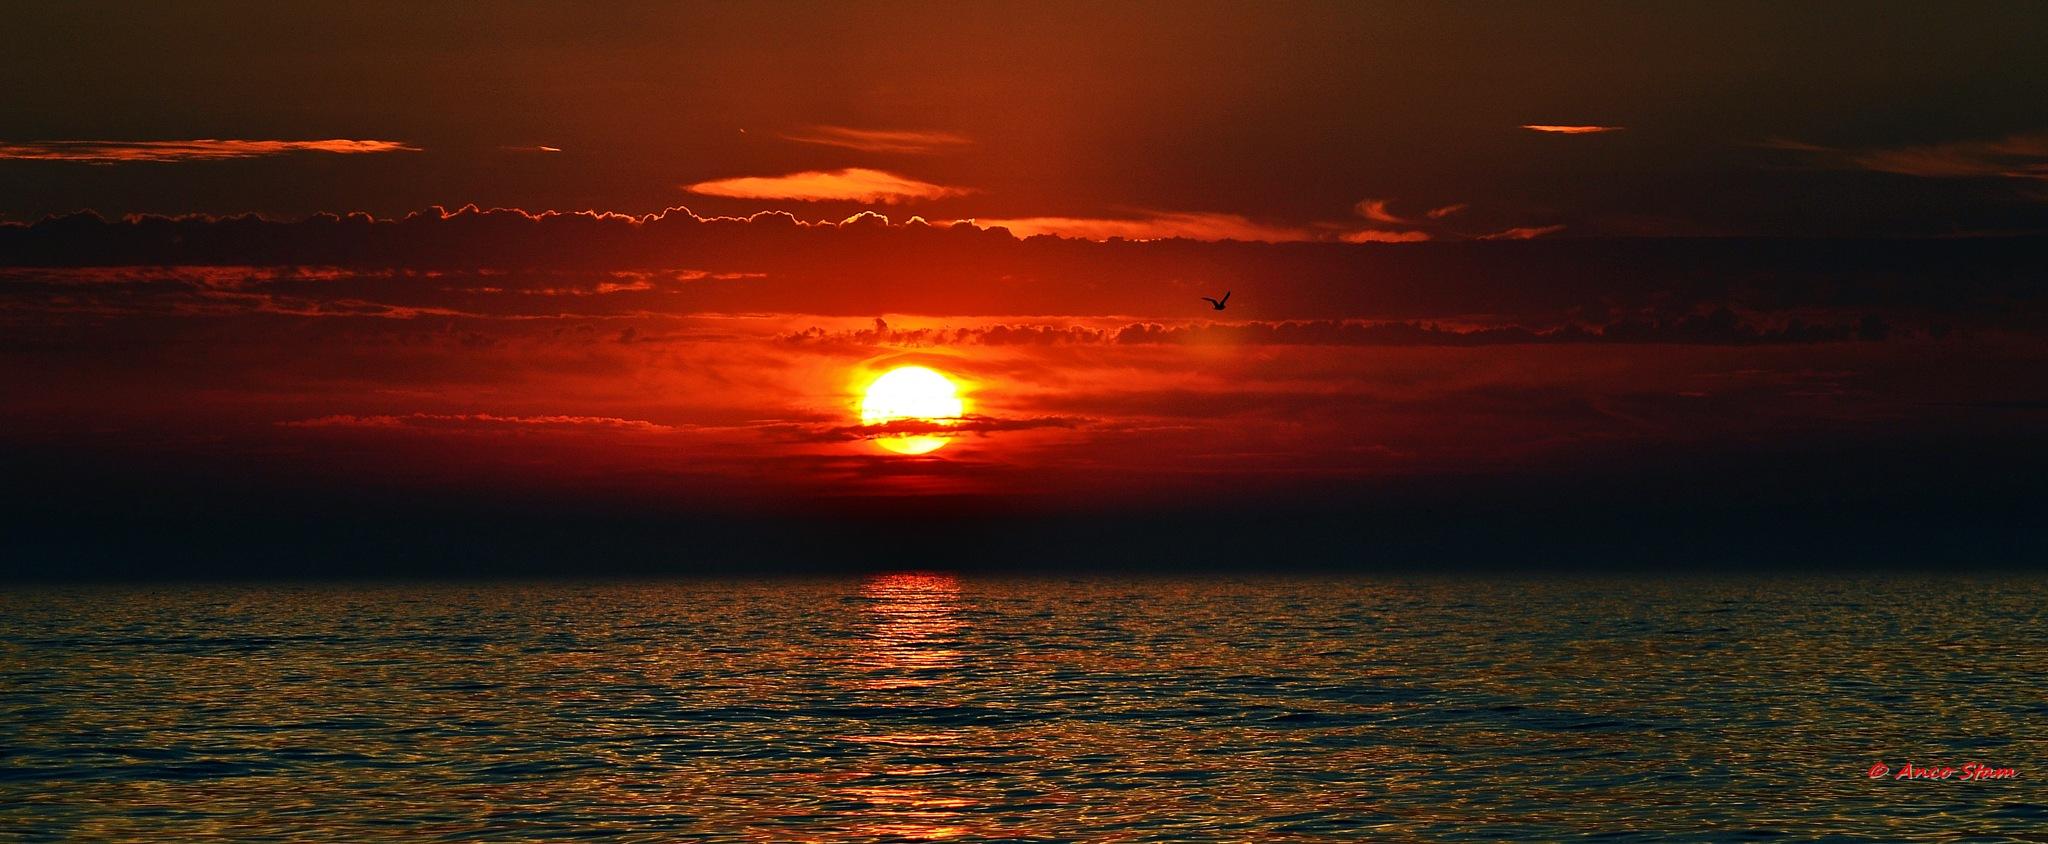 sun sets in sea by Anco Stam